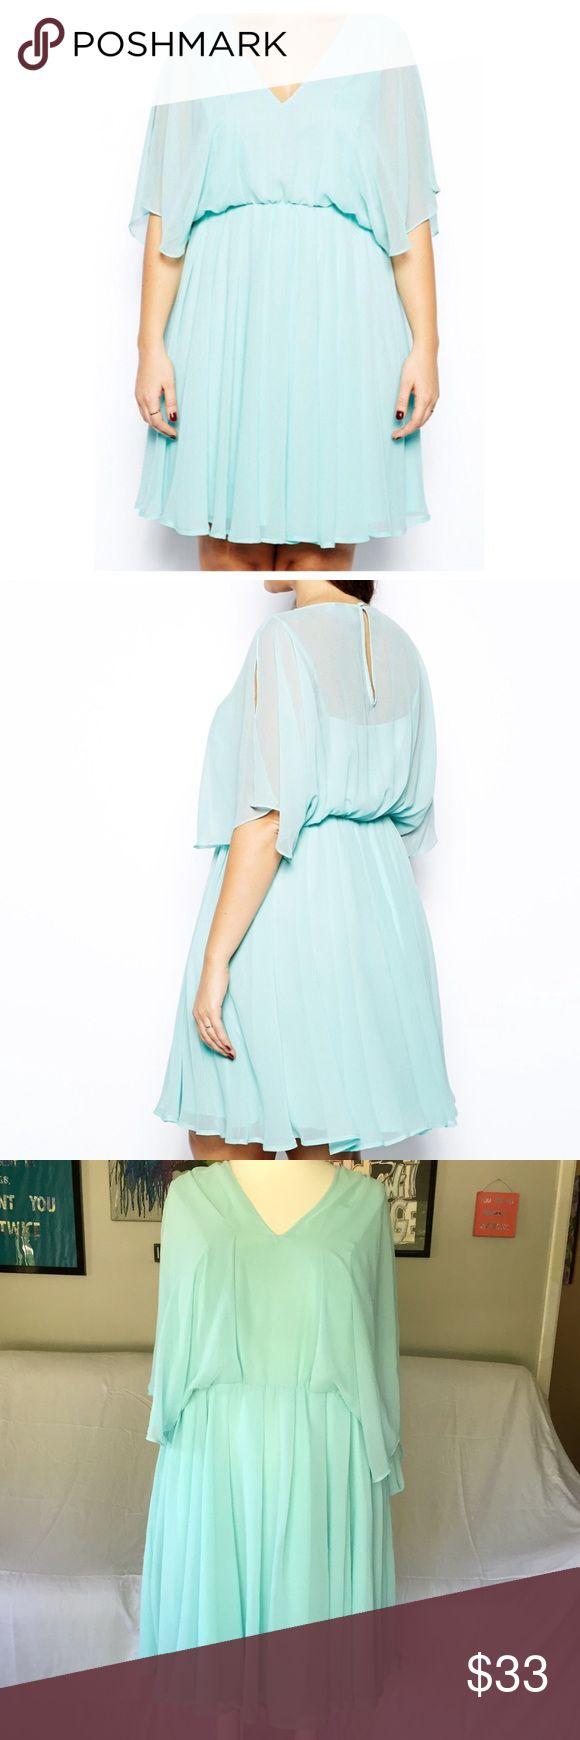 ASOS Curve Dress So pretty! Sheer aqua skater dress with angel sleeves. ASOS Curve Dresses Midi